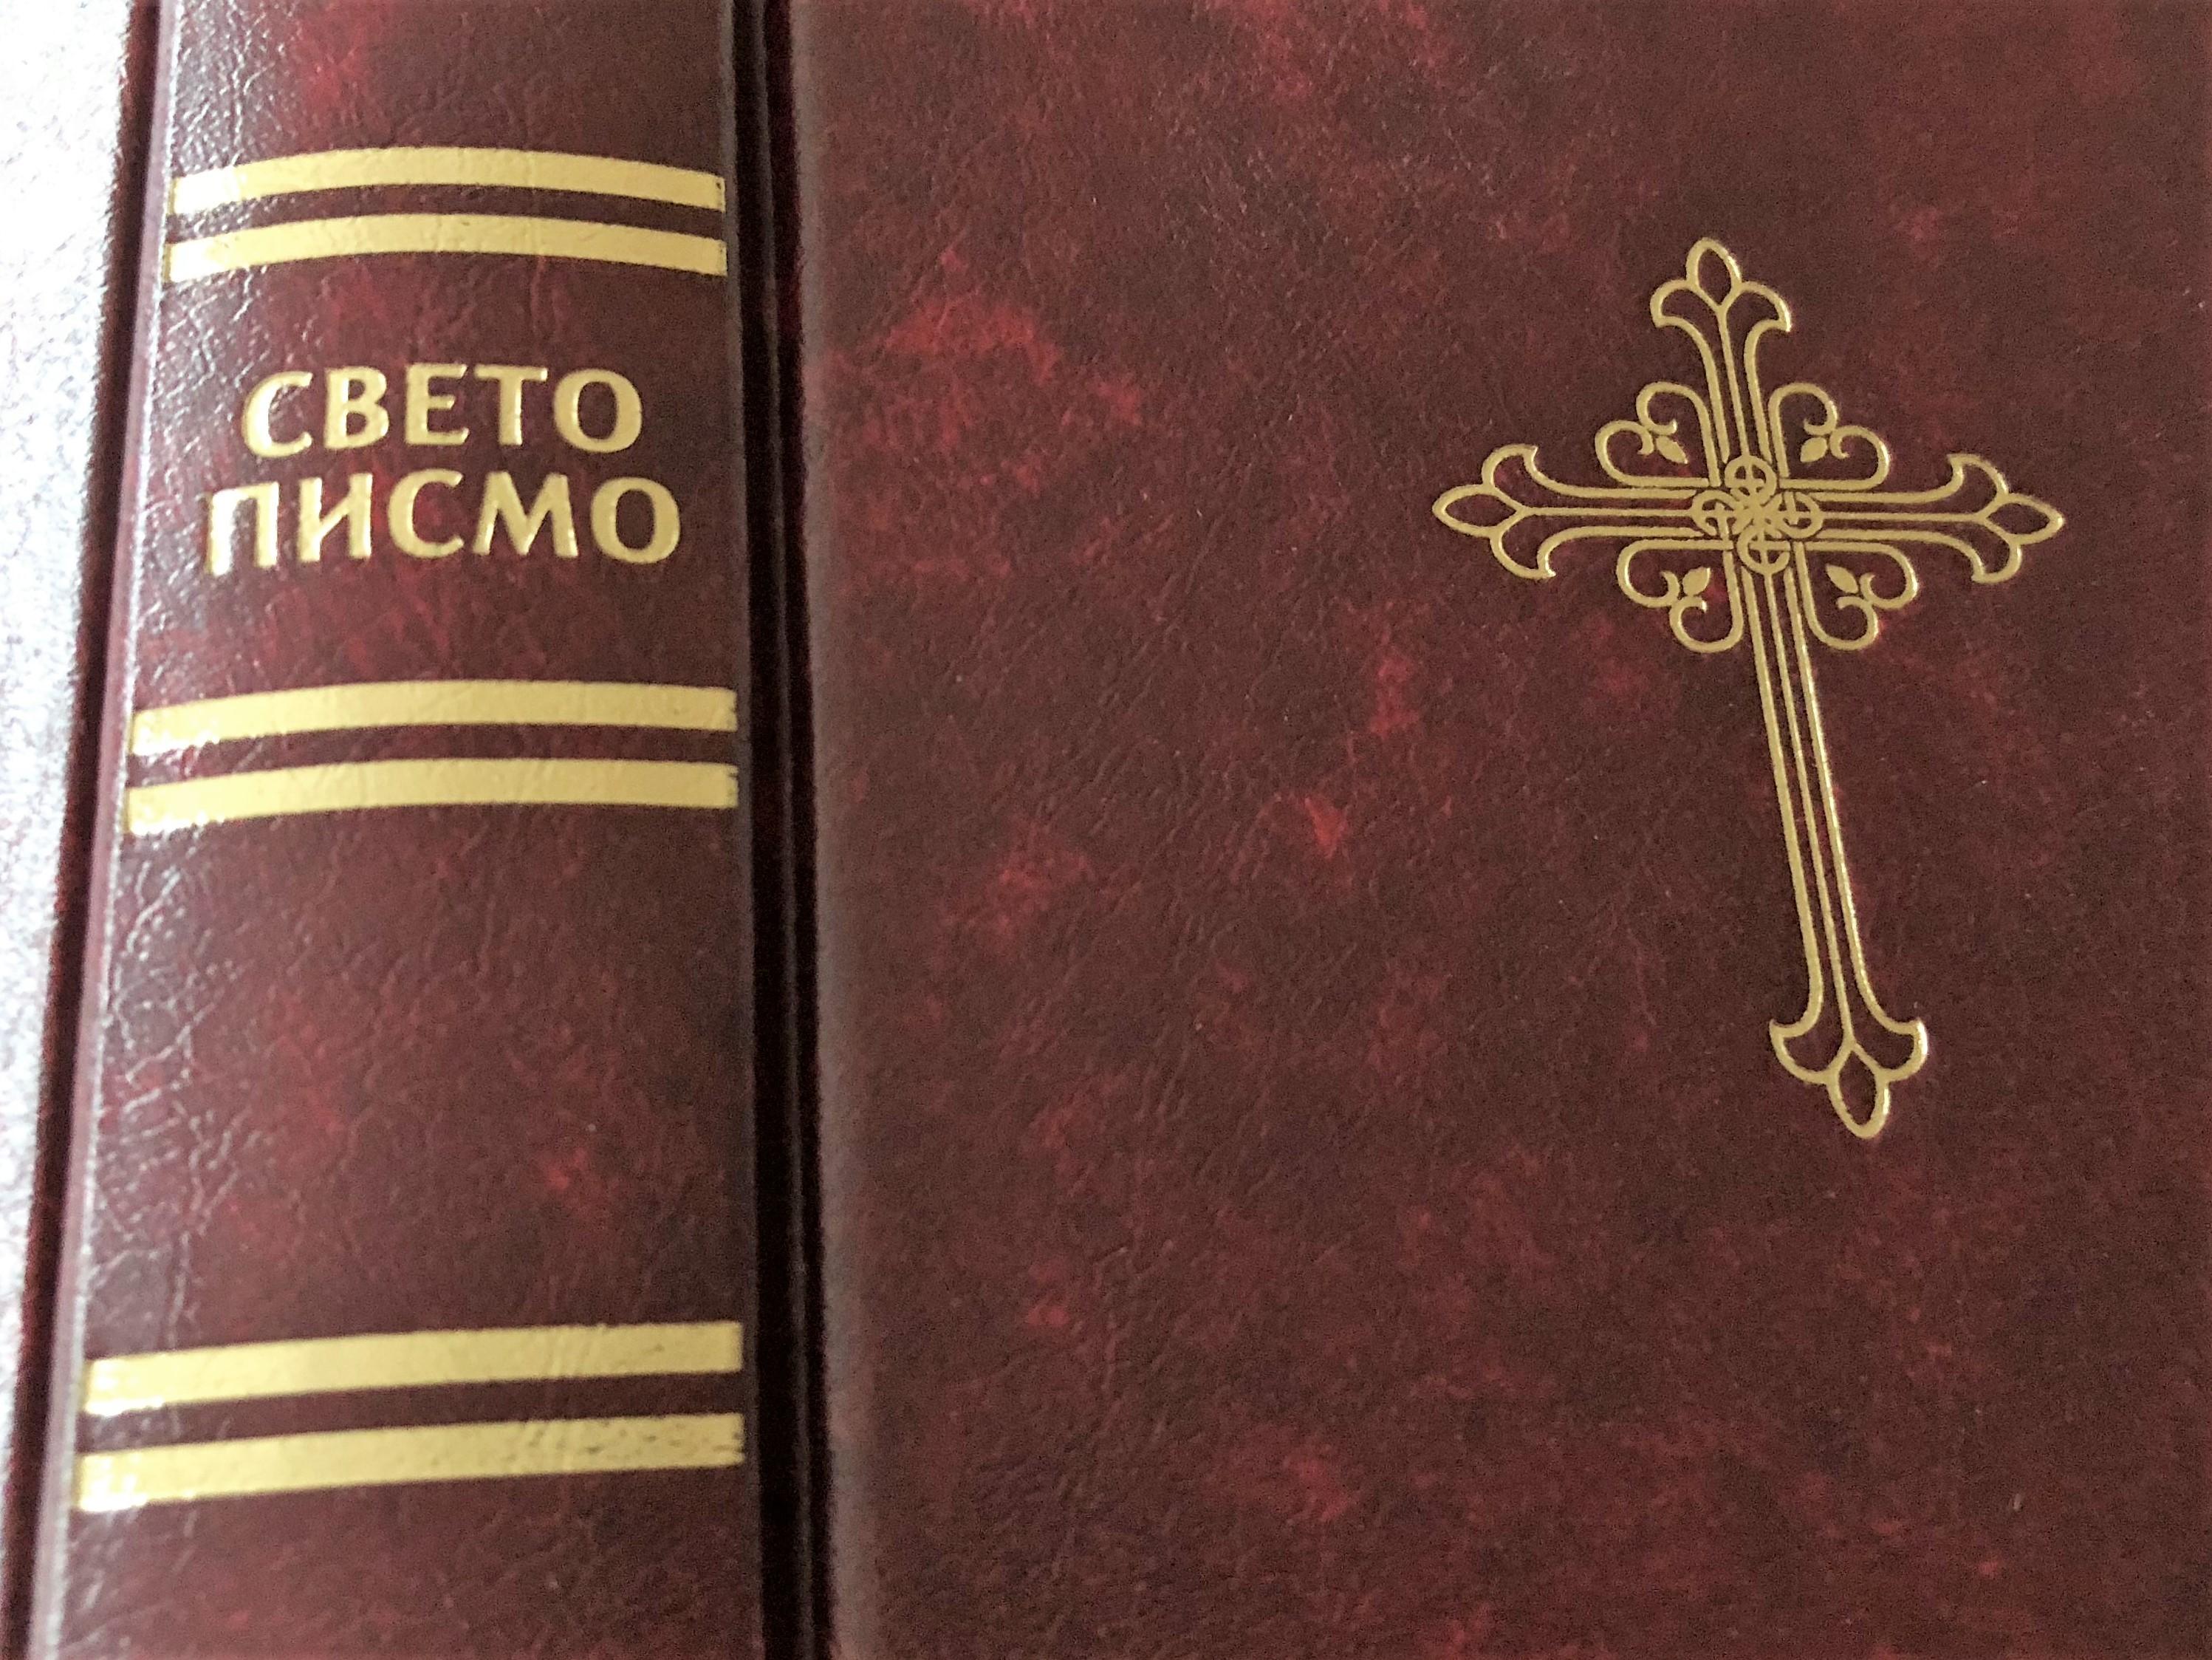 serbian-language-bible-burgundy-cover-with-golden-cross-cyrillic-script-043hs-7-.jpg